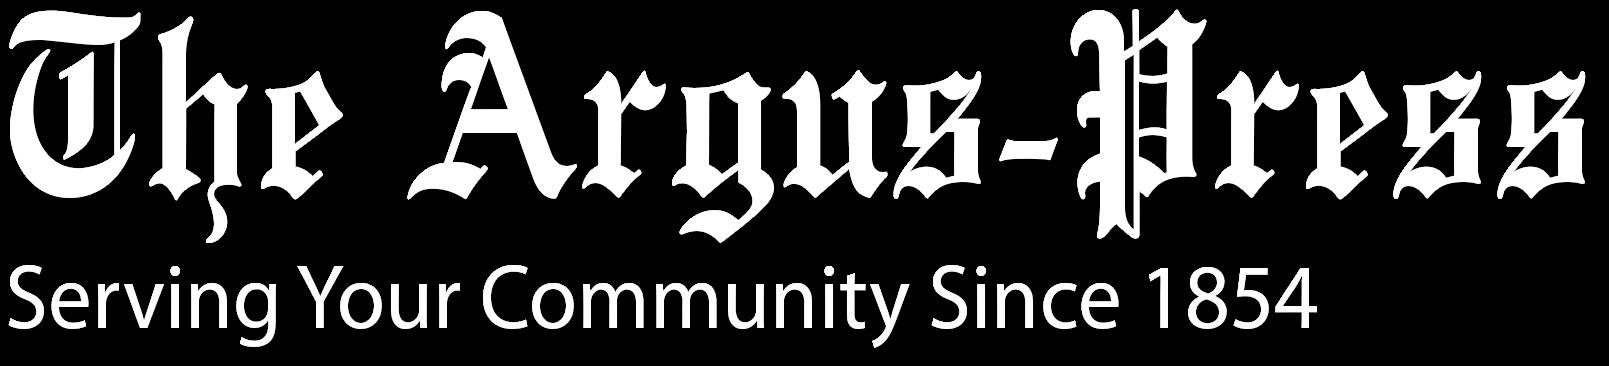 Argus-Press